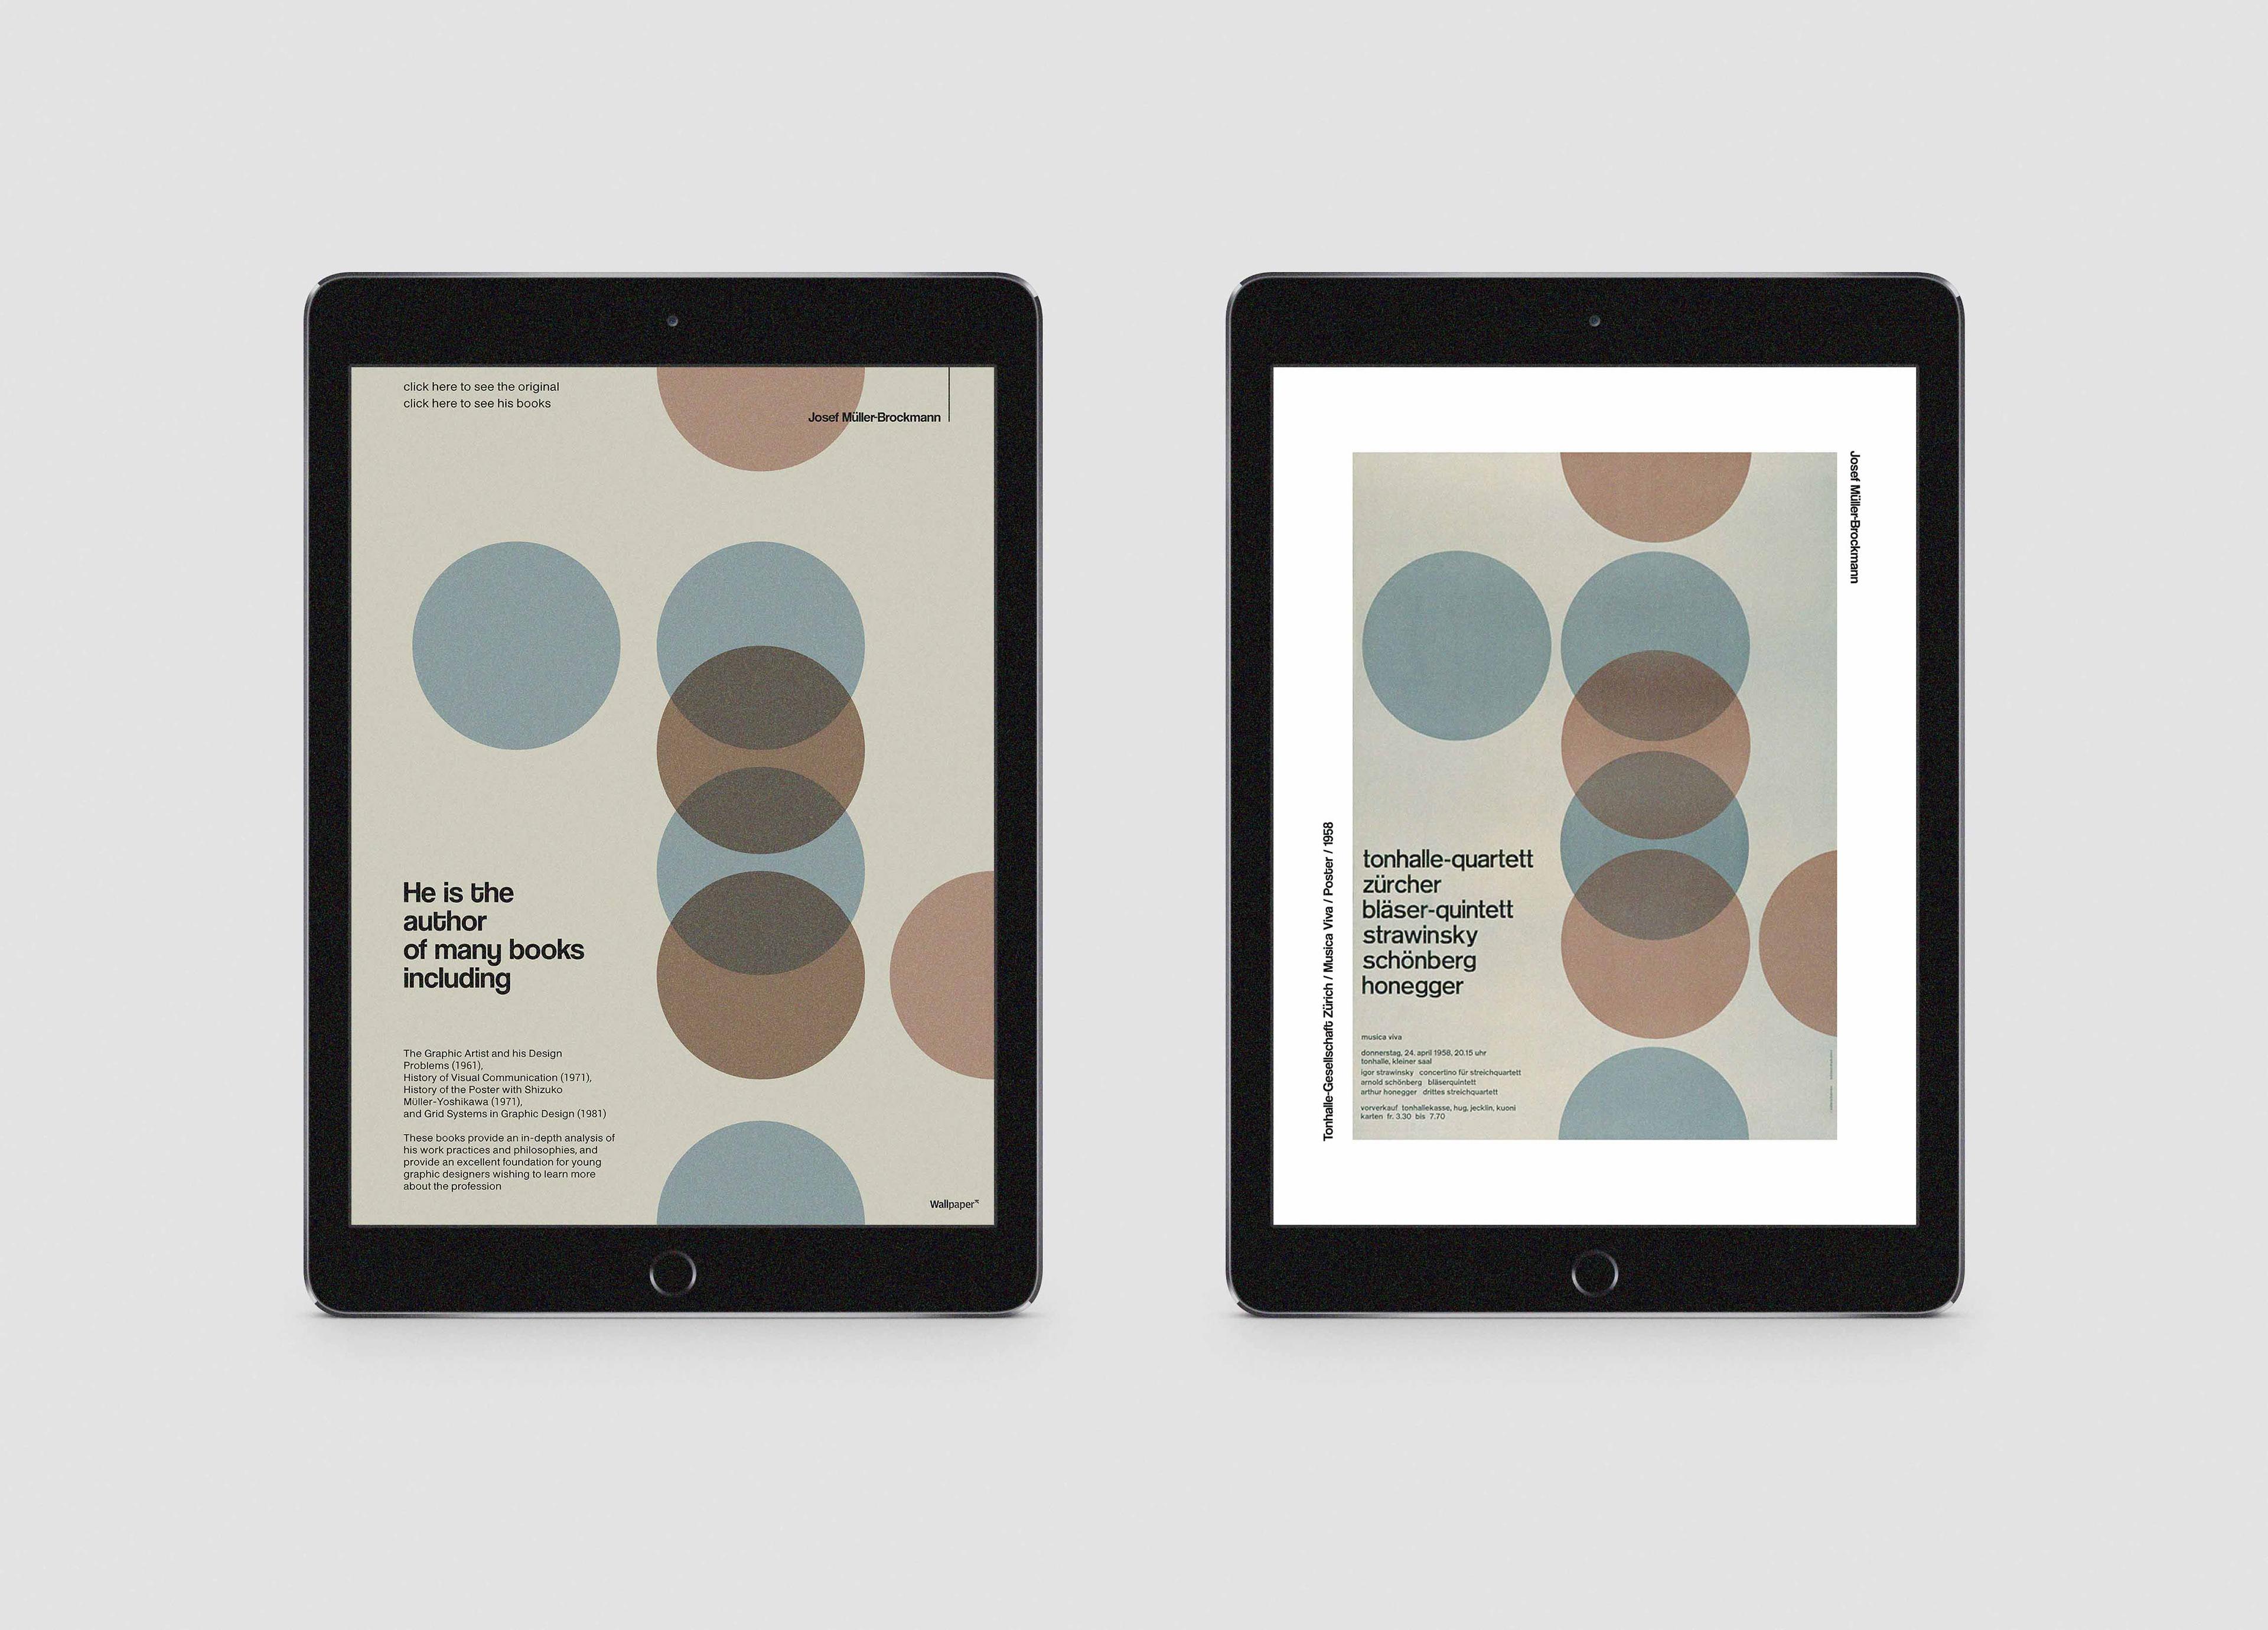 Ryan Anthony Ward - FUI Design, 3D MoGraph, Graphic Design ...